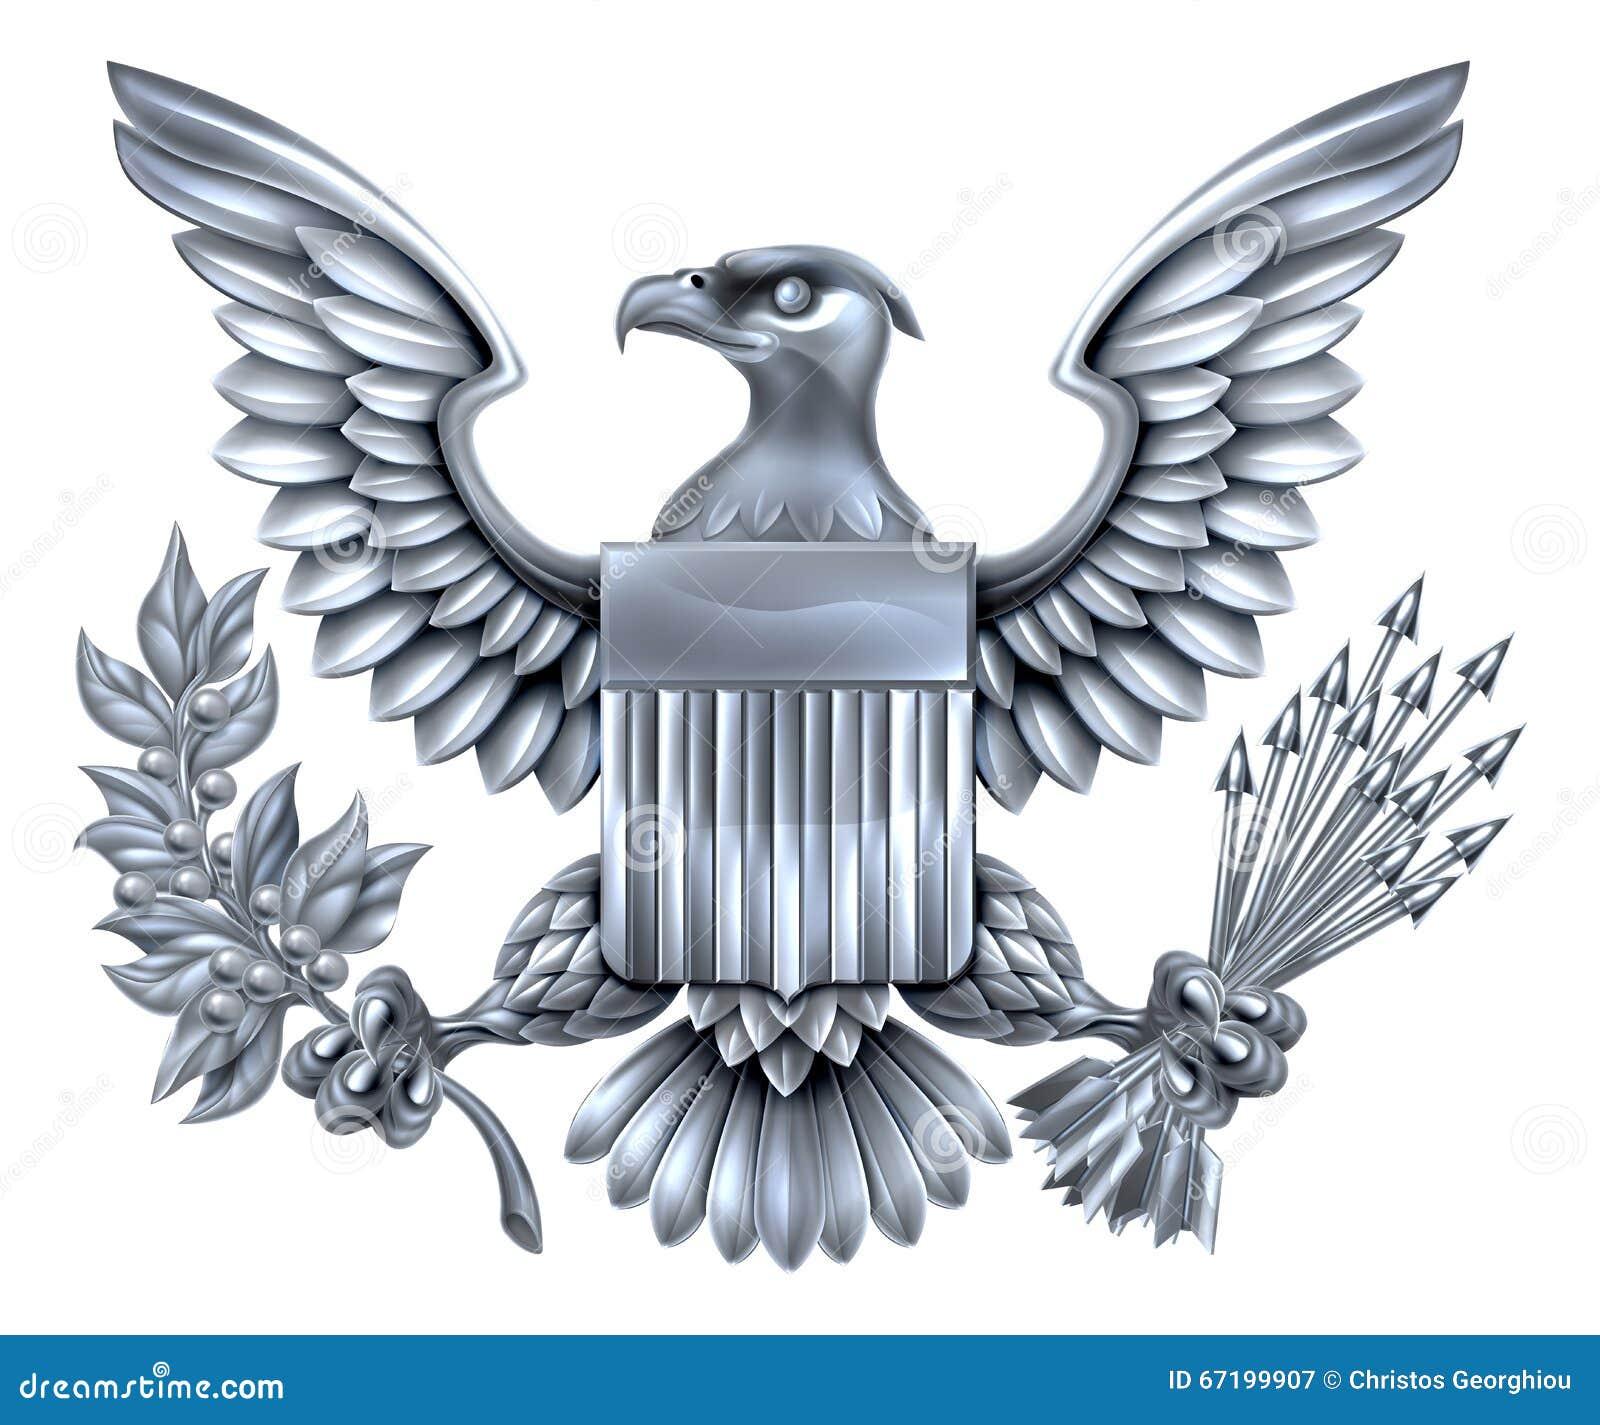 American Eagle (AEO) SWOT Analysis